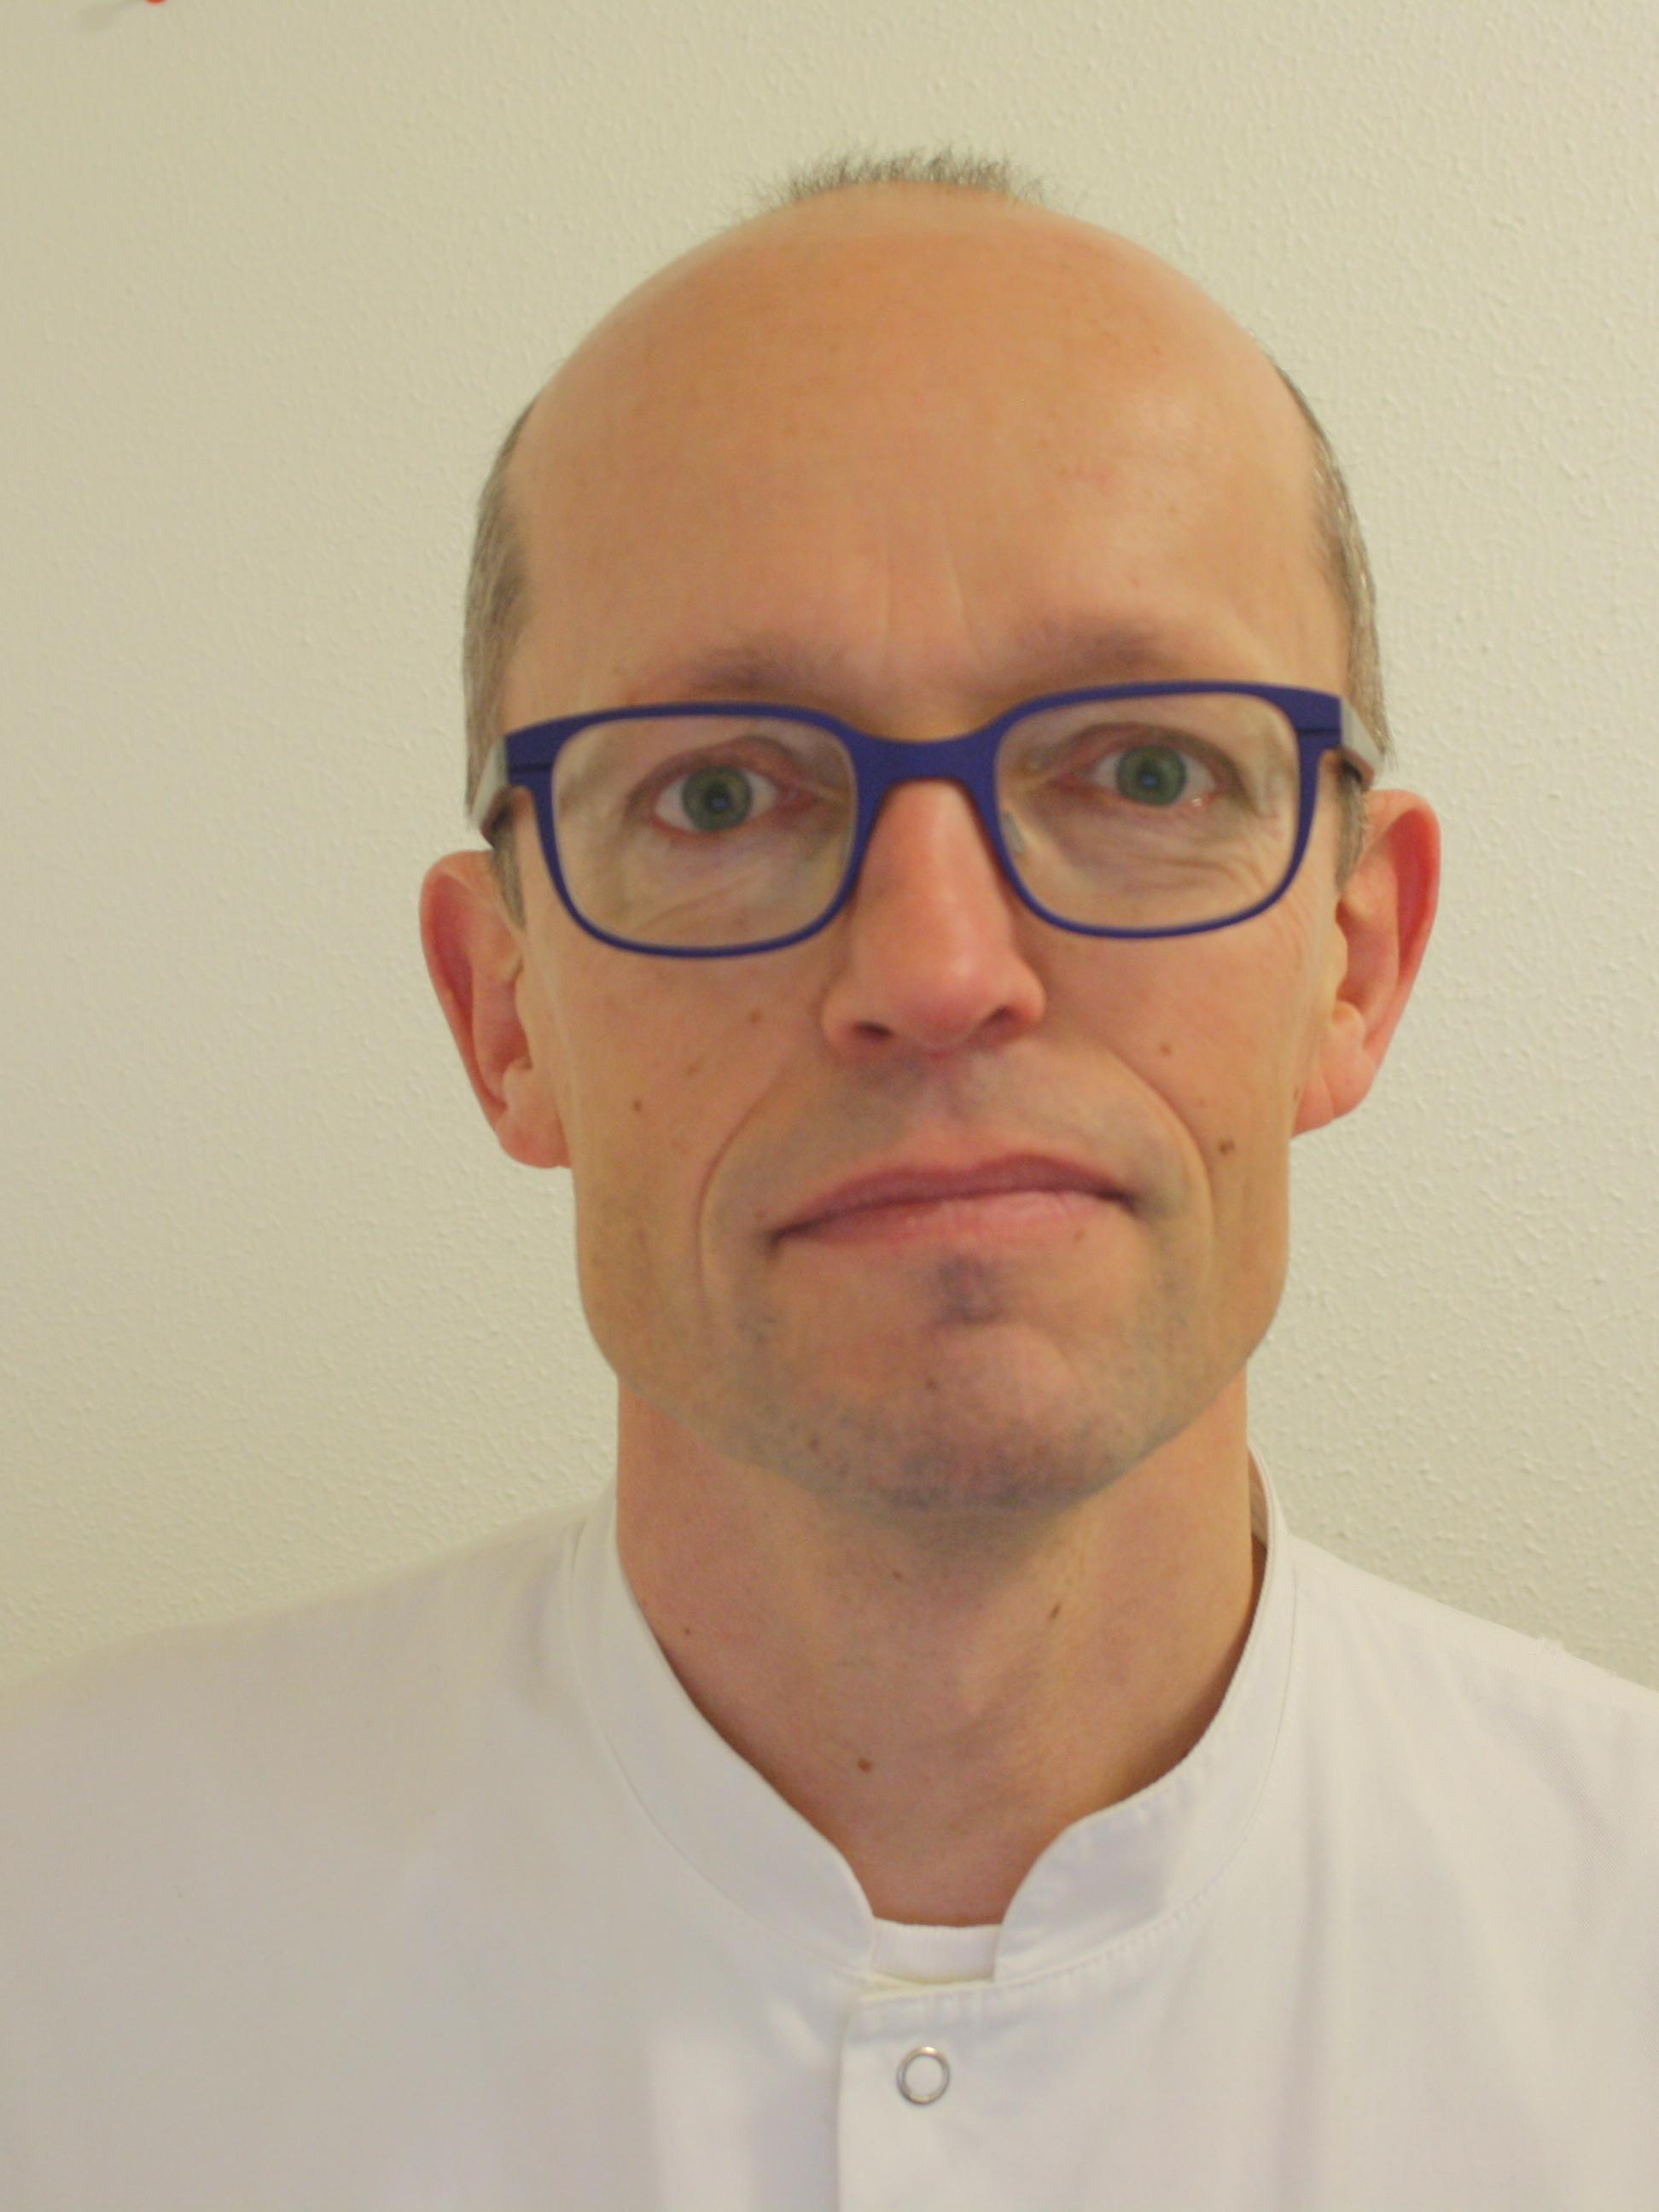 Mortensen, Michael Bau - 57131